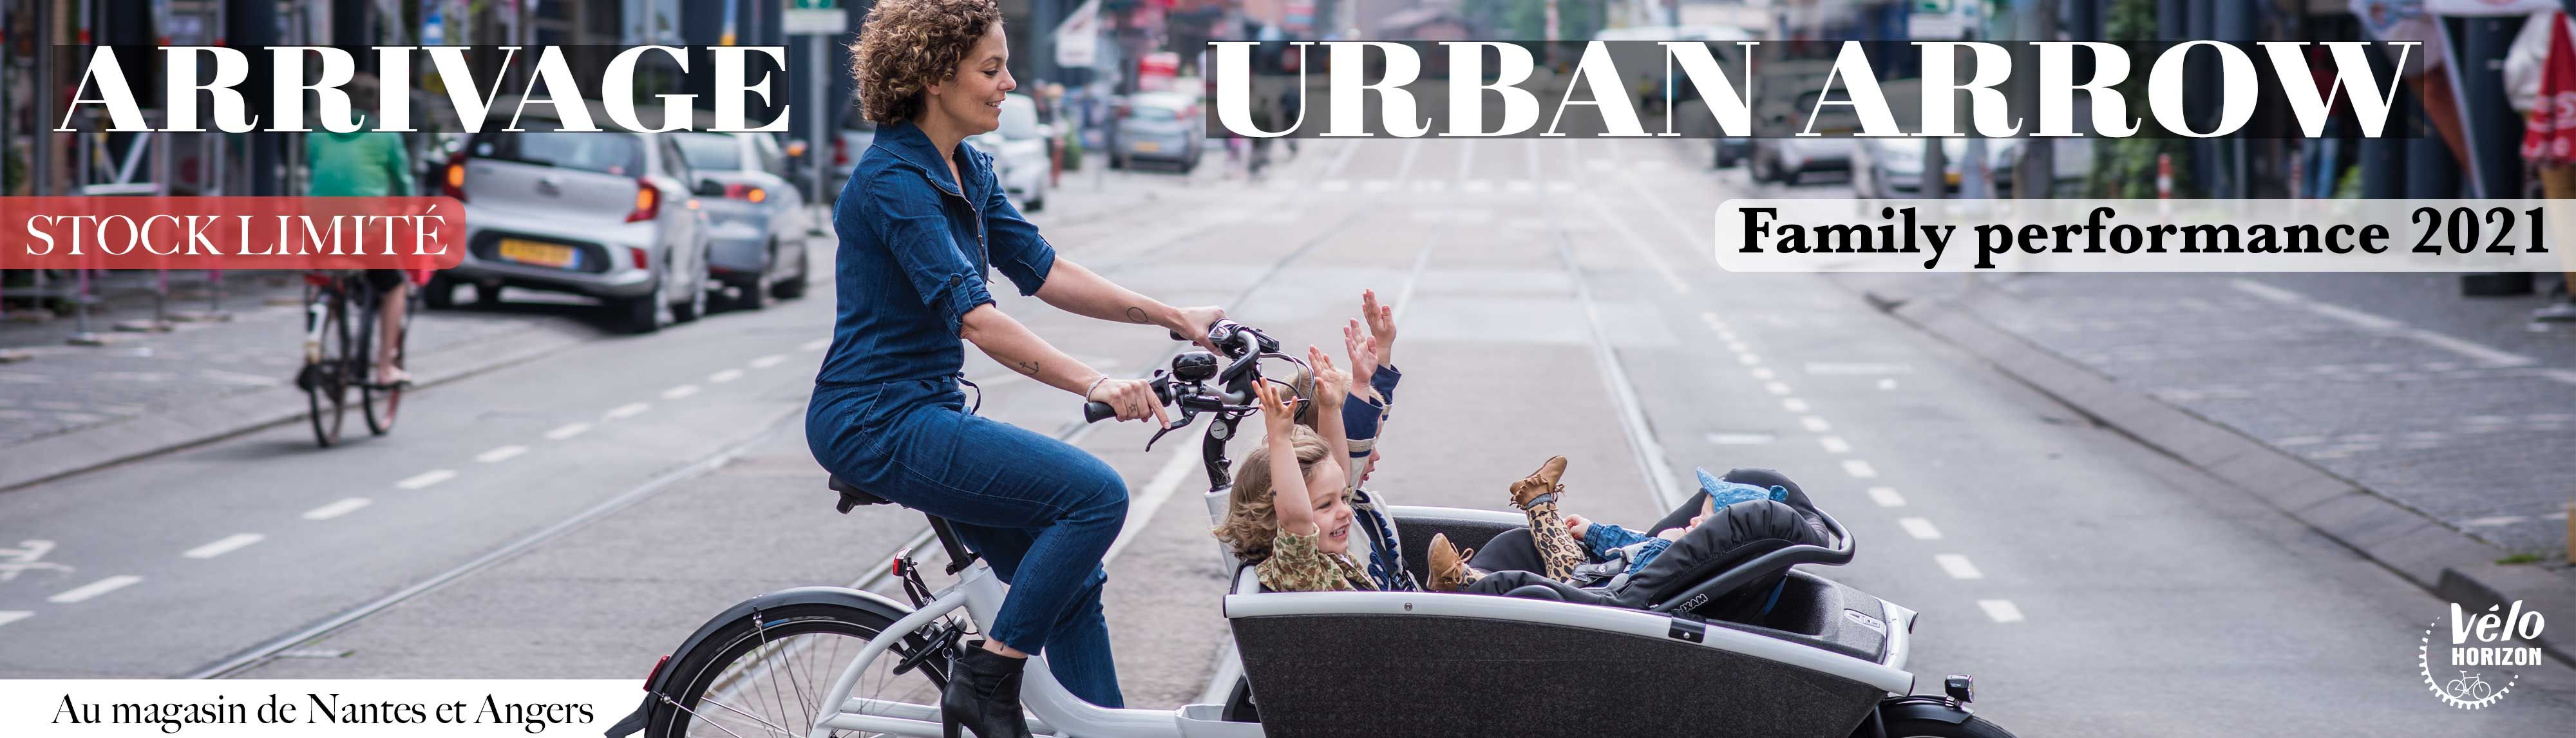 Arrivage Urban Arrow